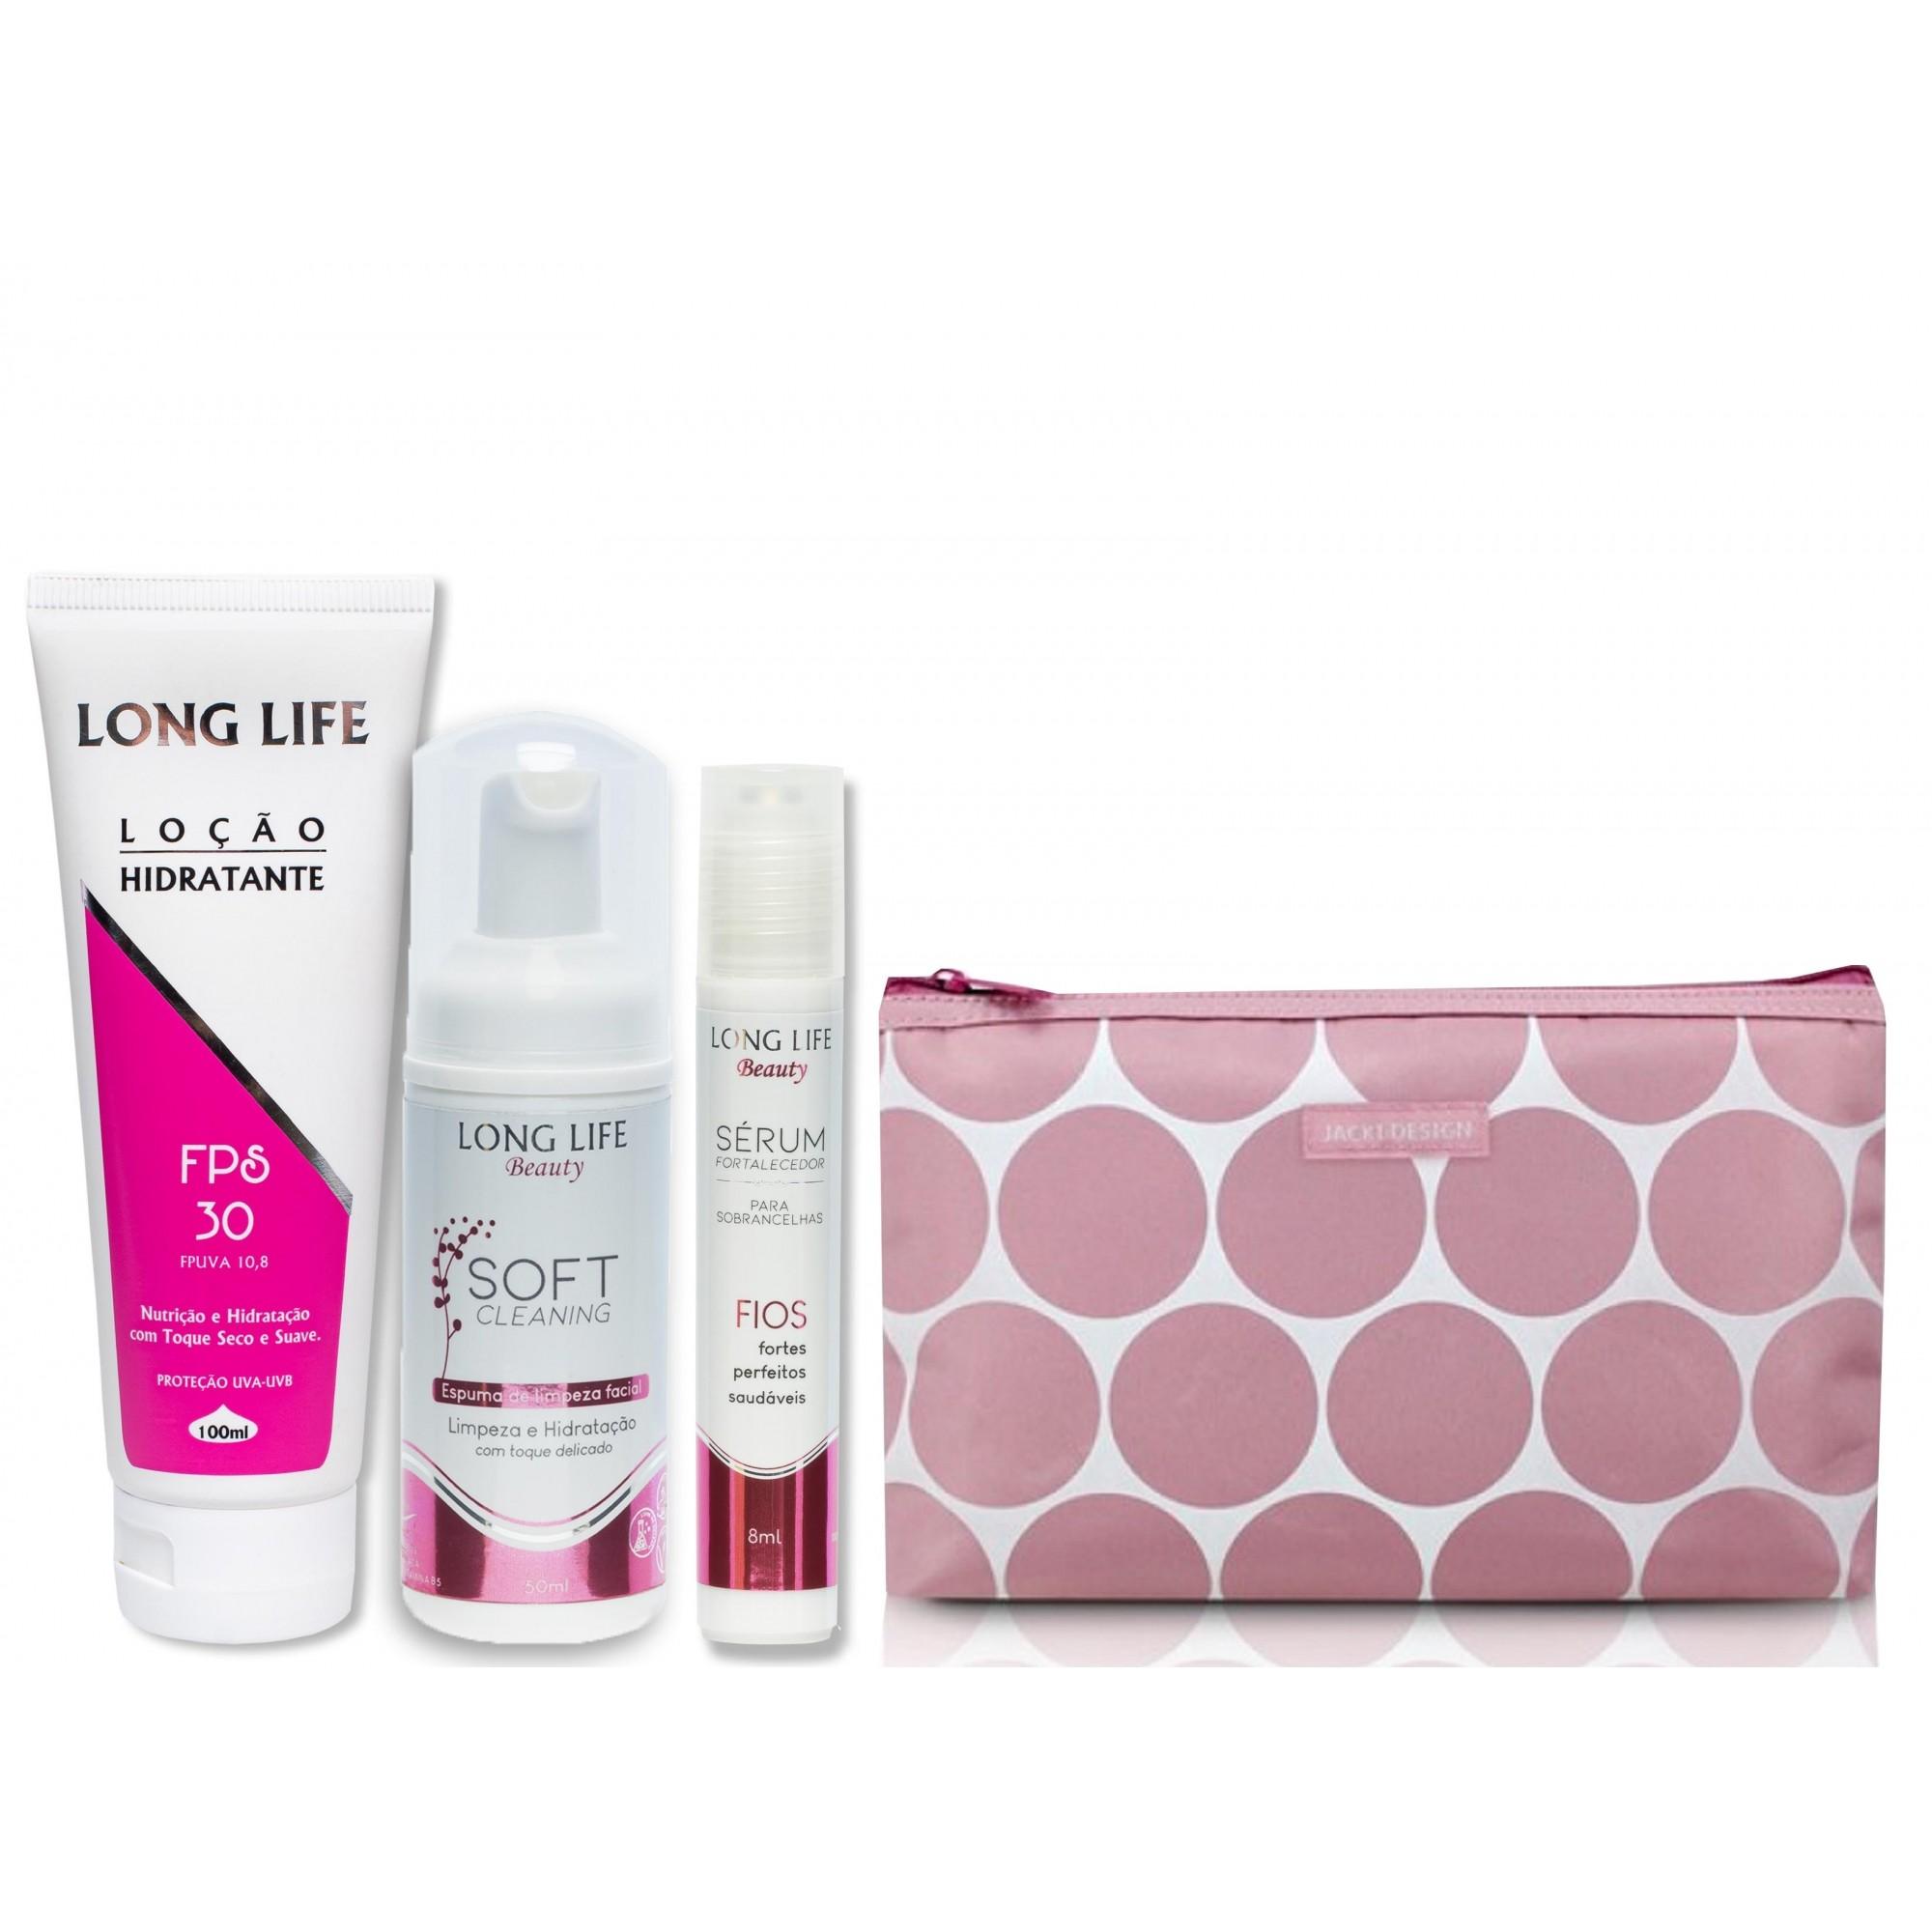 Kit Master Skin Care - Sérum Fortalecedor 8 ml + Soft Cleaning 50 ml + Hidratante FPS 30 100 ml